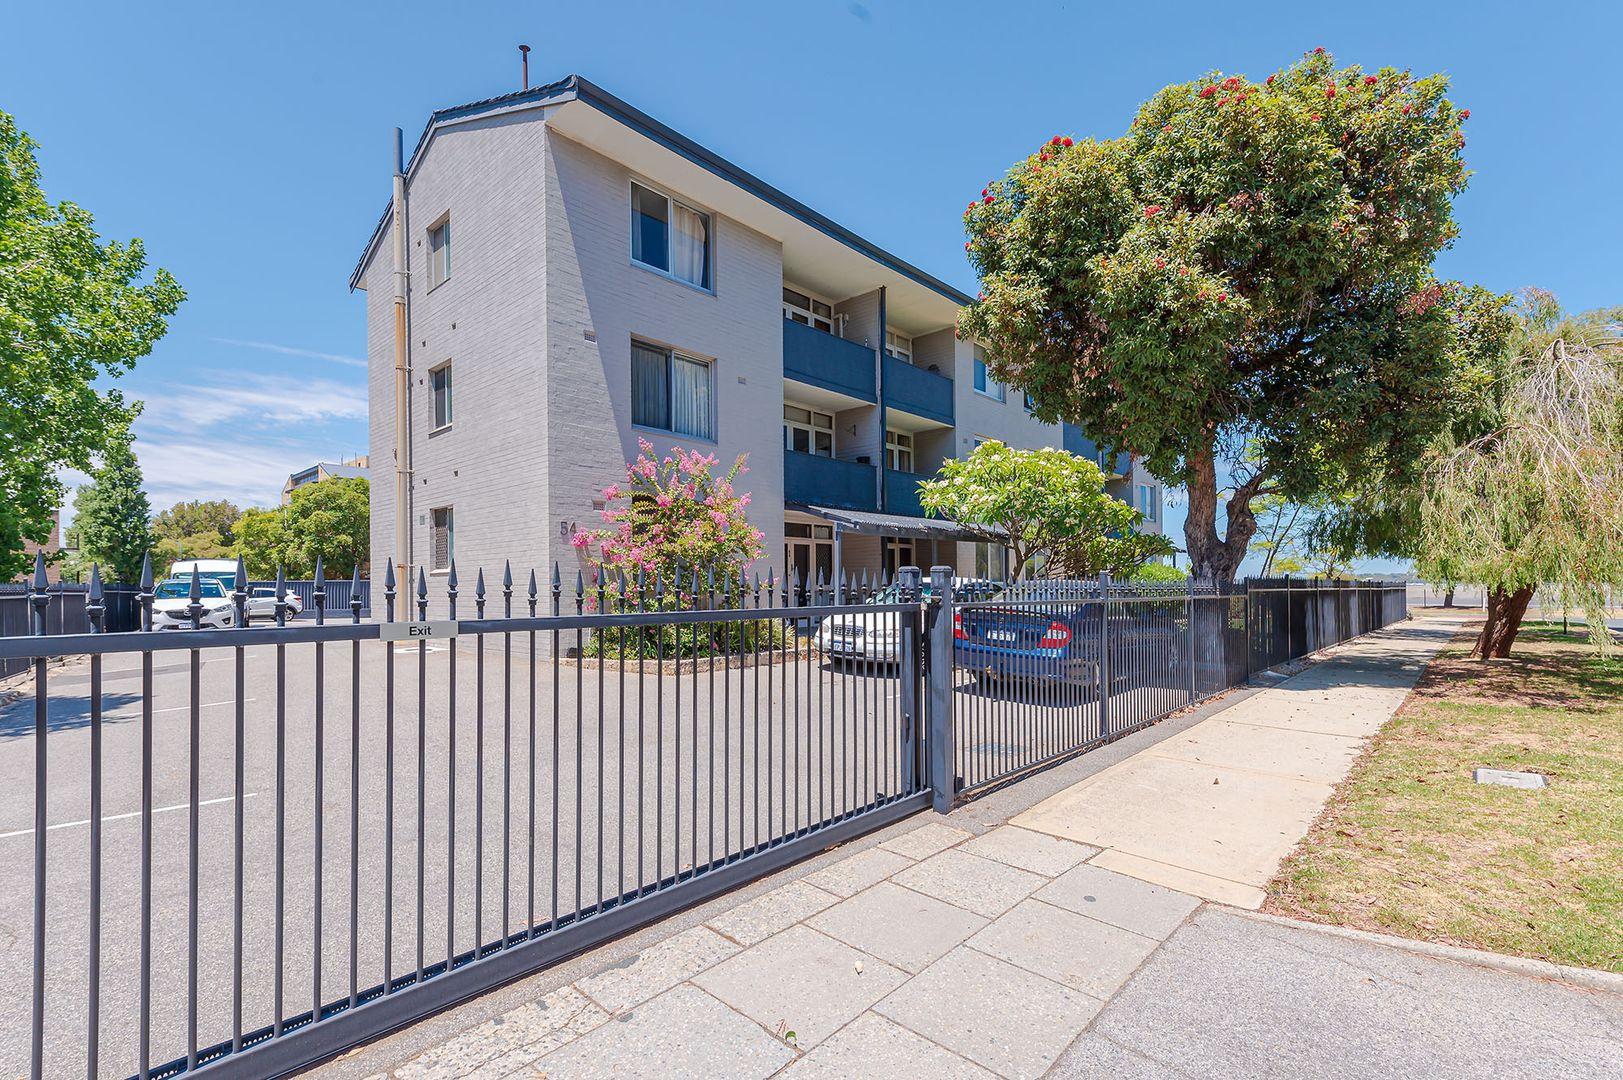 17/54 Melville Pde, South Perth WA 6151, Image 1